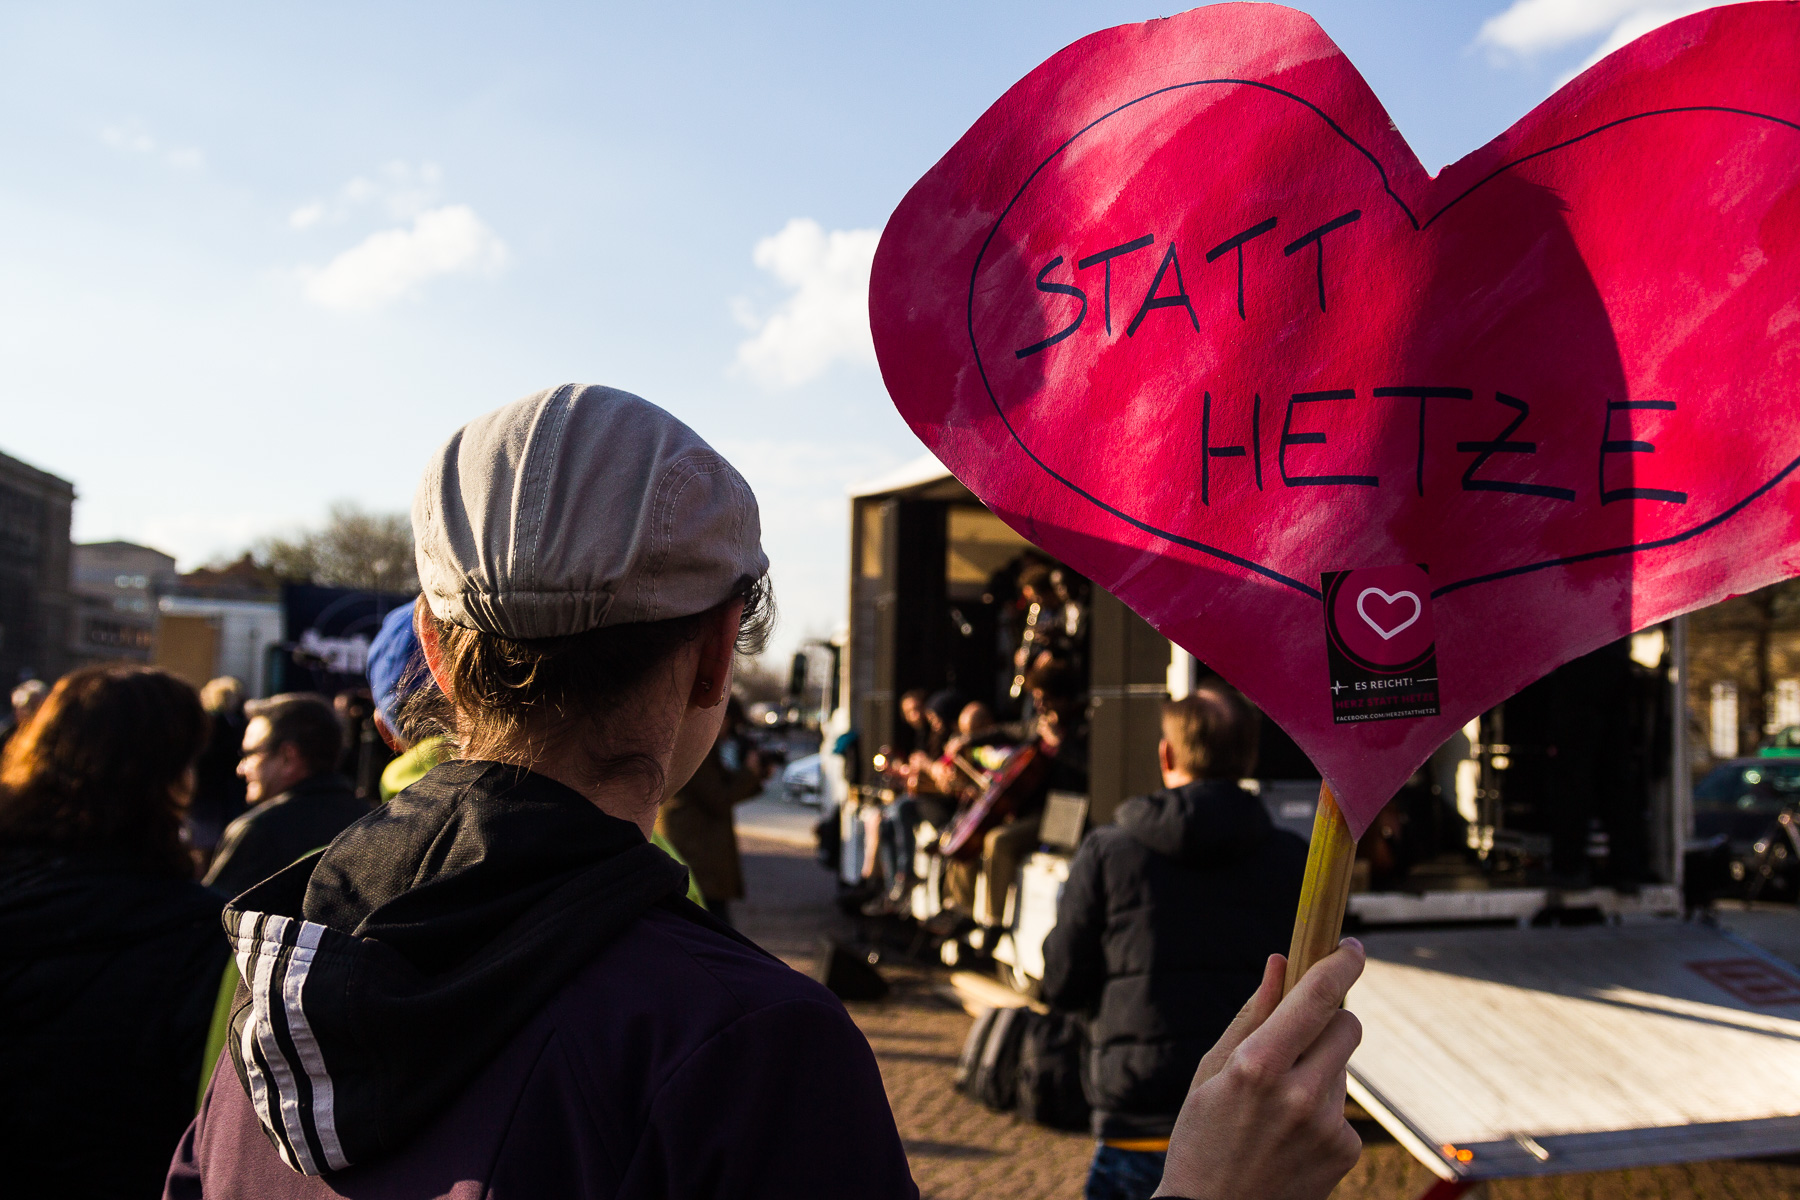 Gegenprotest bei Pegida-Demonstration